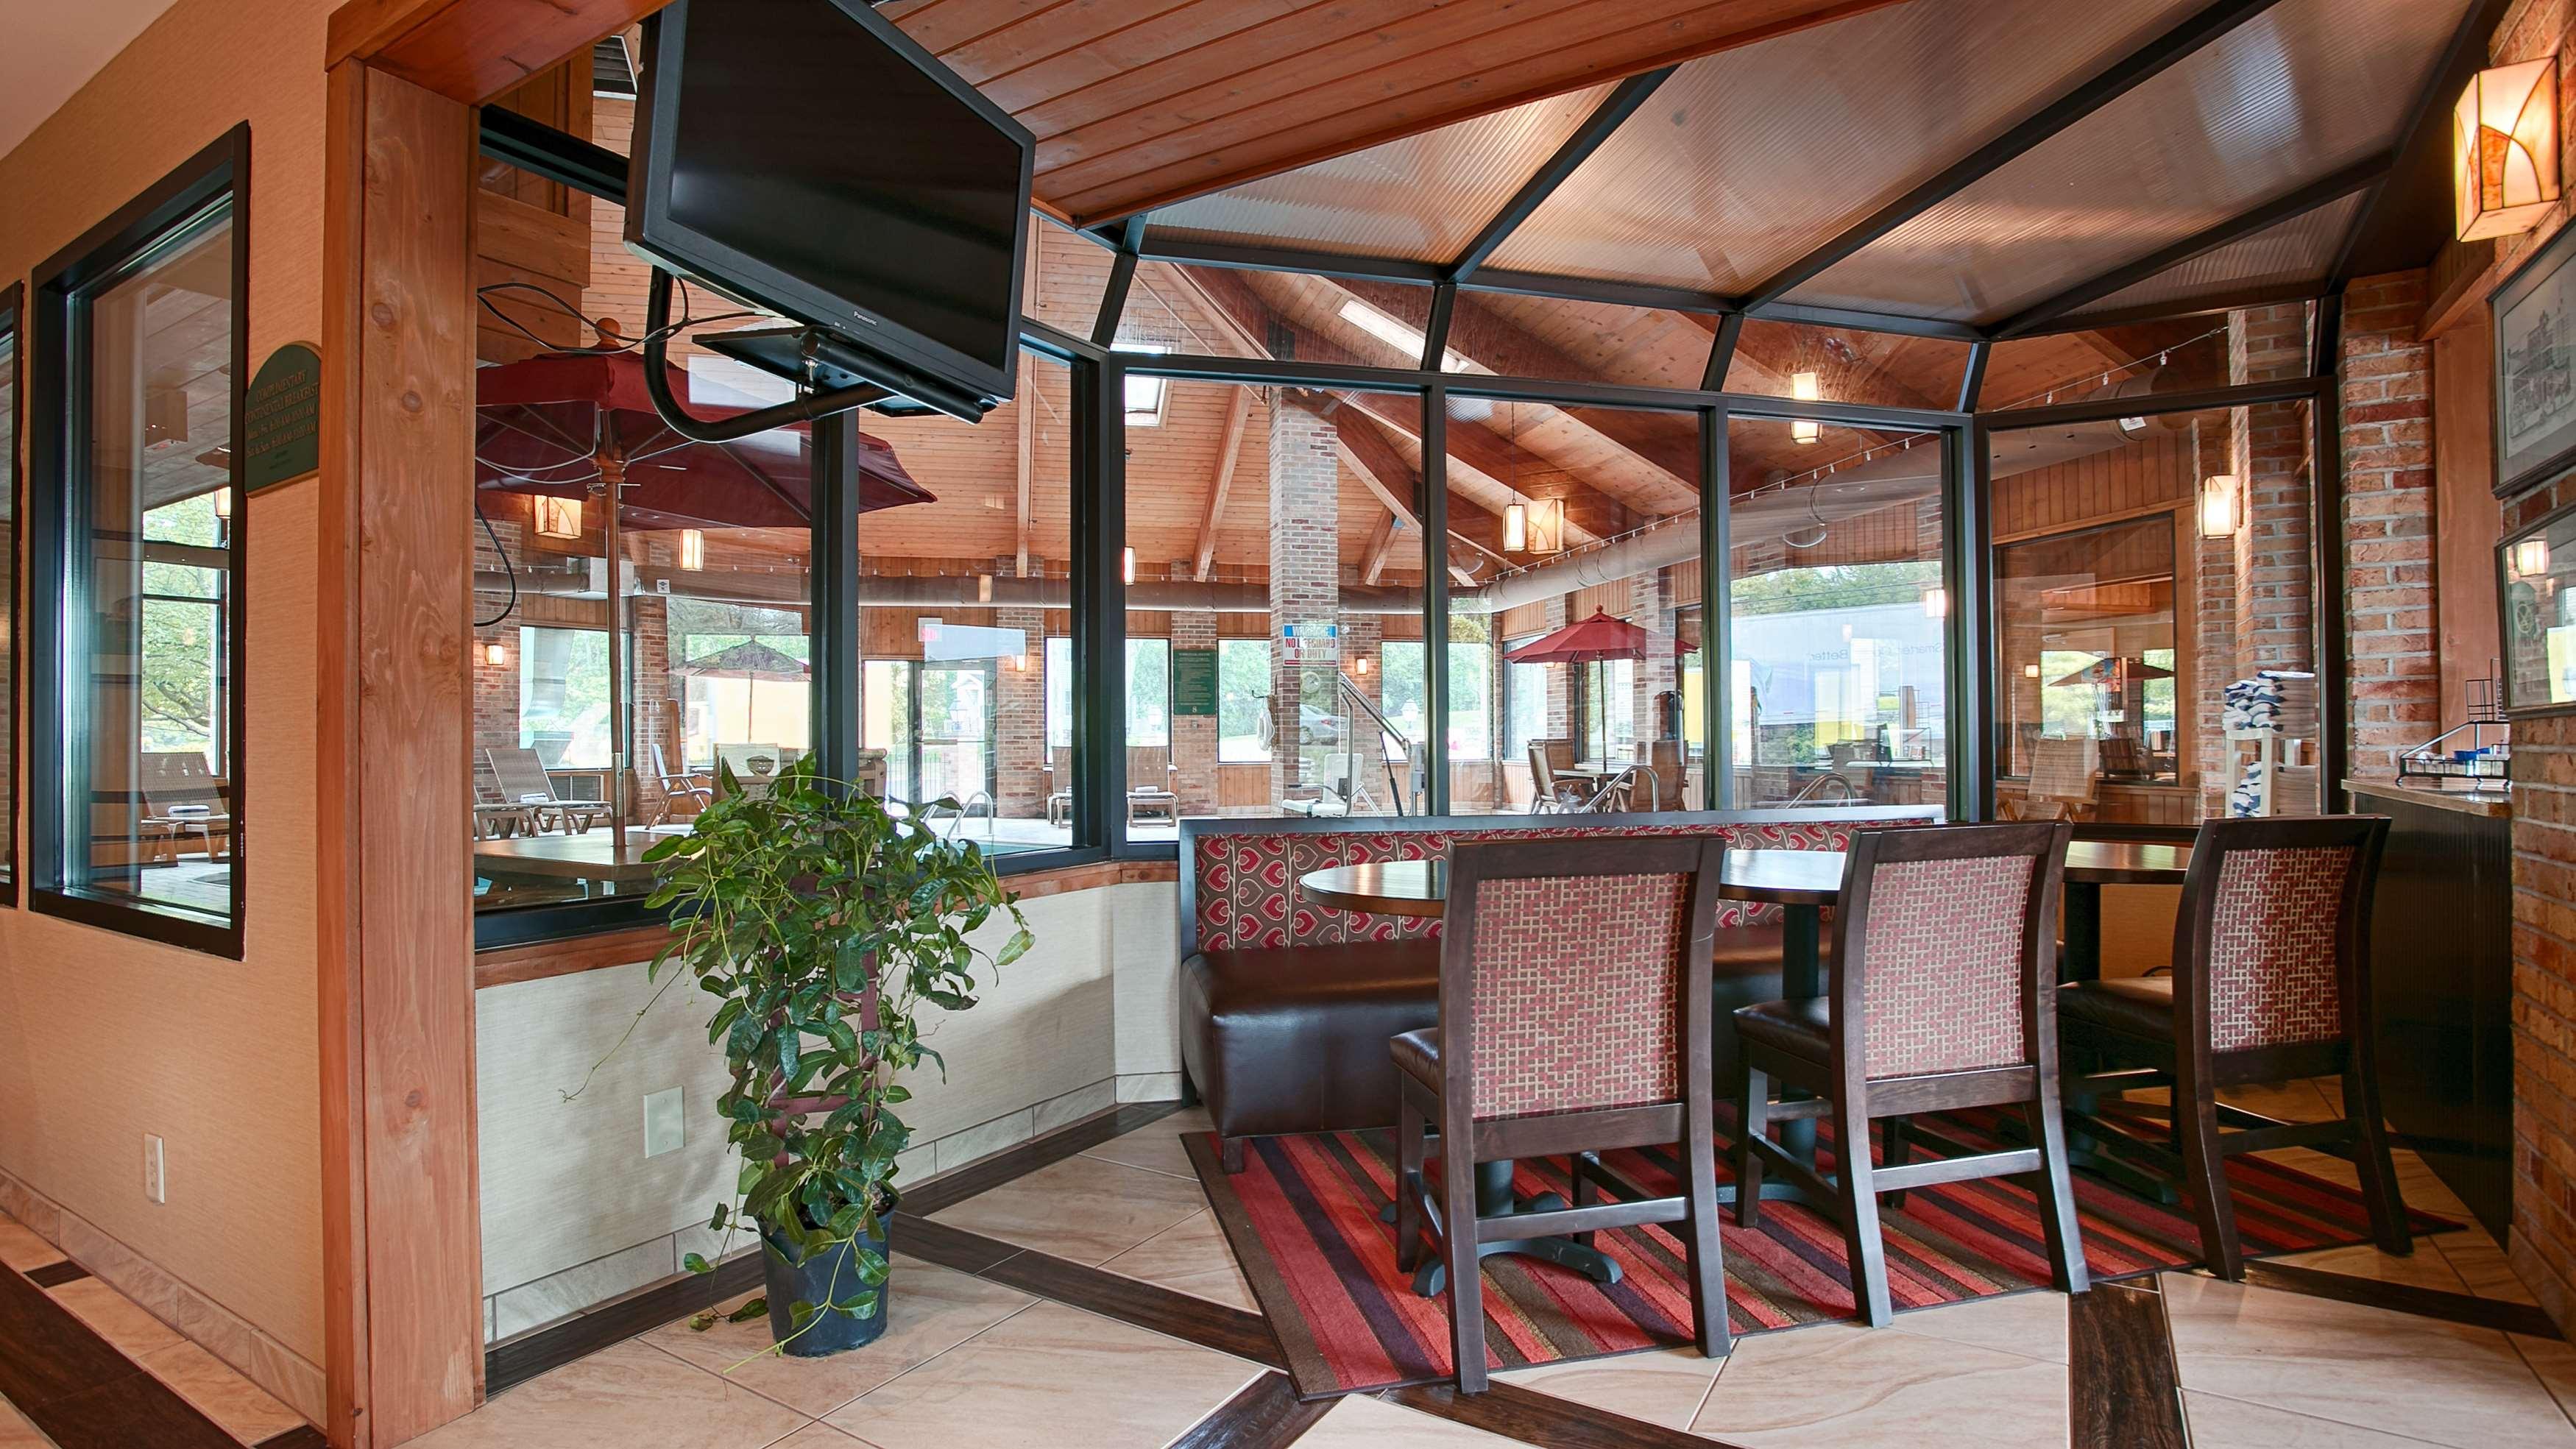 Best Western Sycamore Inn image 9